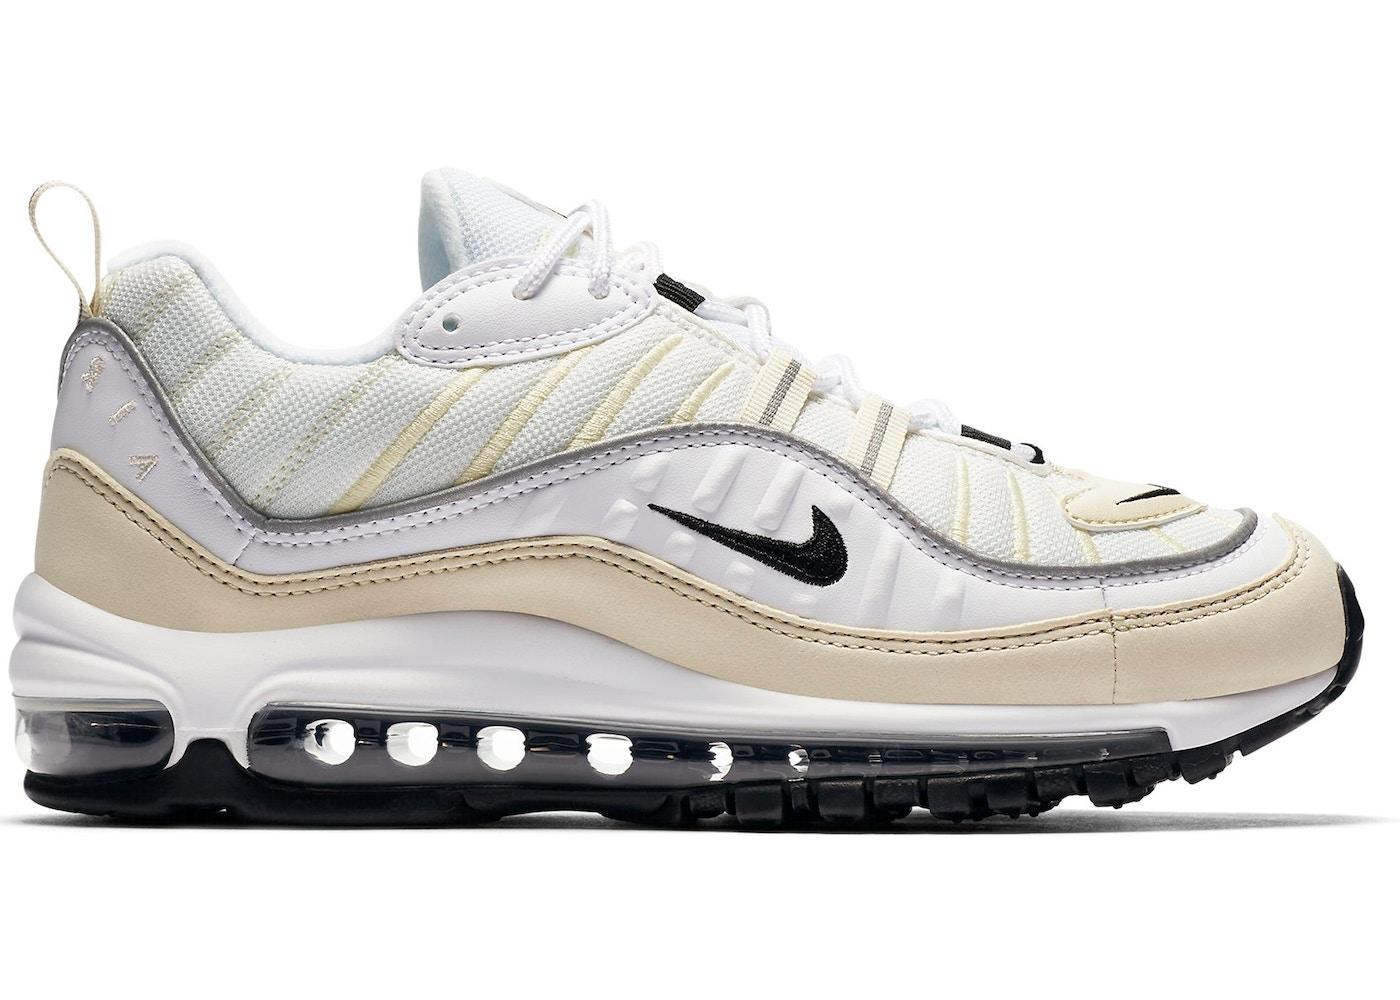 buy online 6f70f 10137 Nike Air Max 98 South Beach 1640744 005 Sneaker Freaker